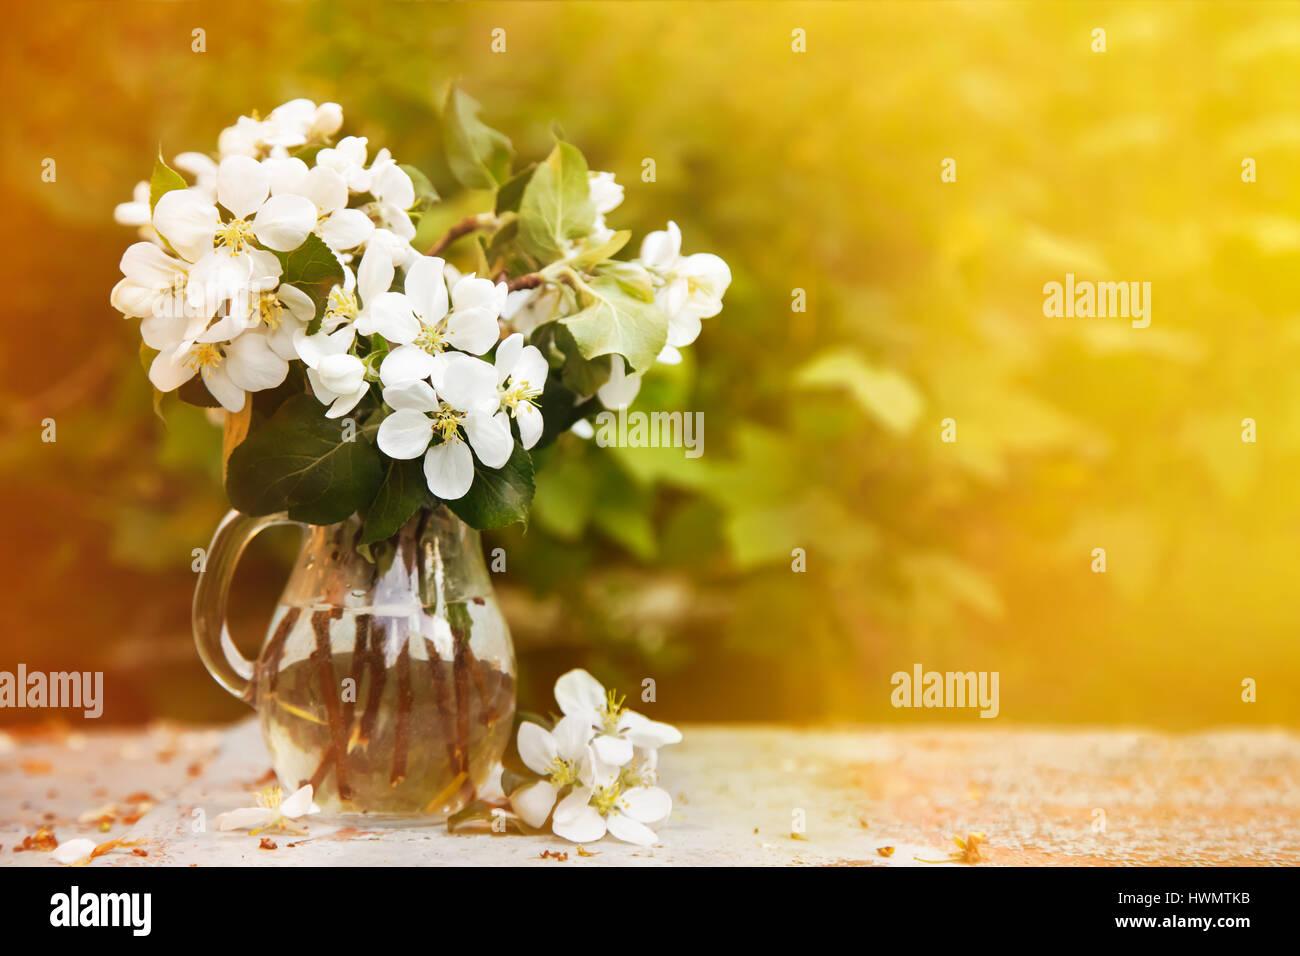 Cherry blossom bouquet - Stock Image